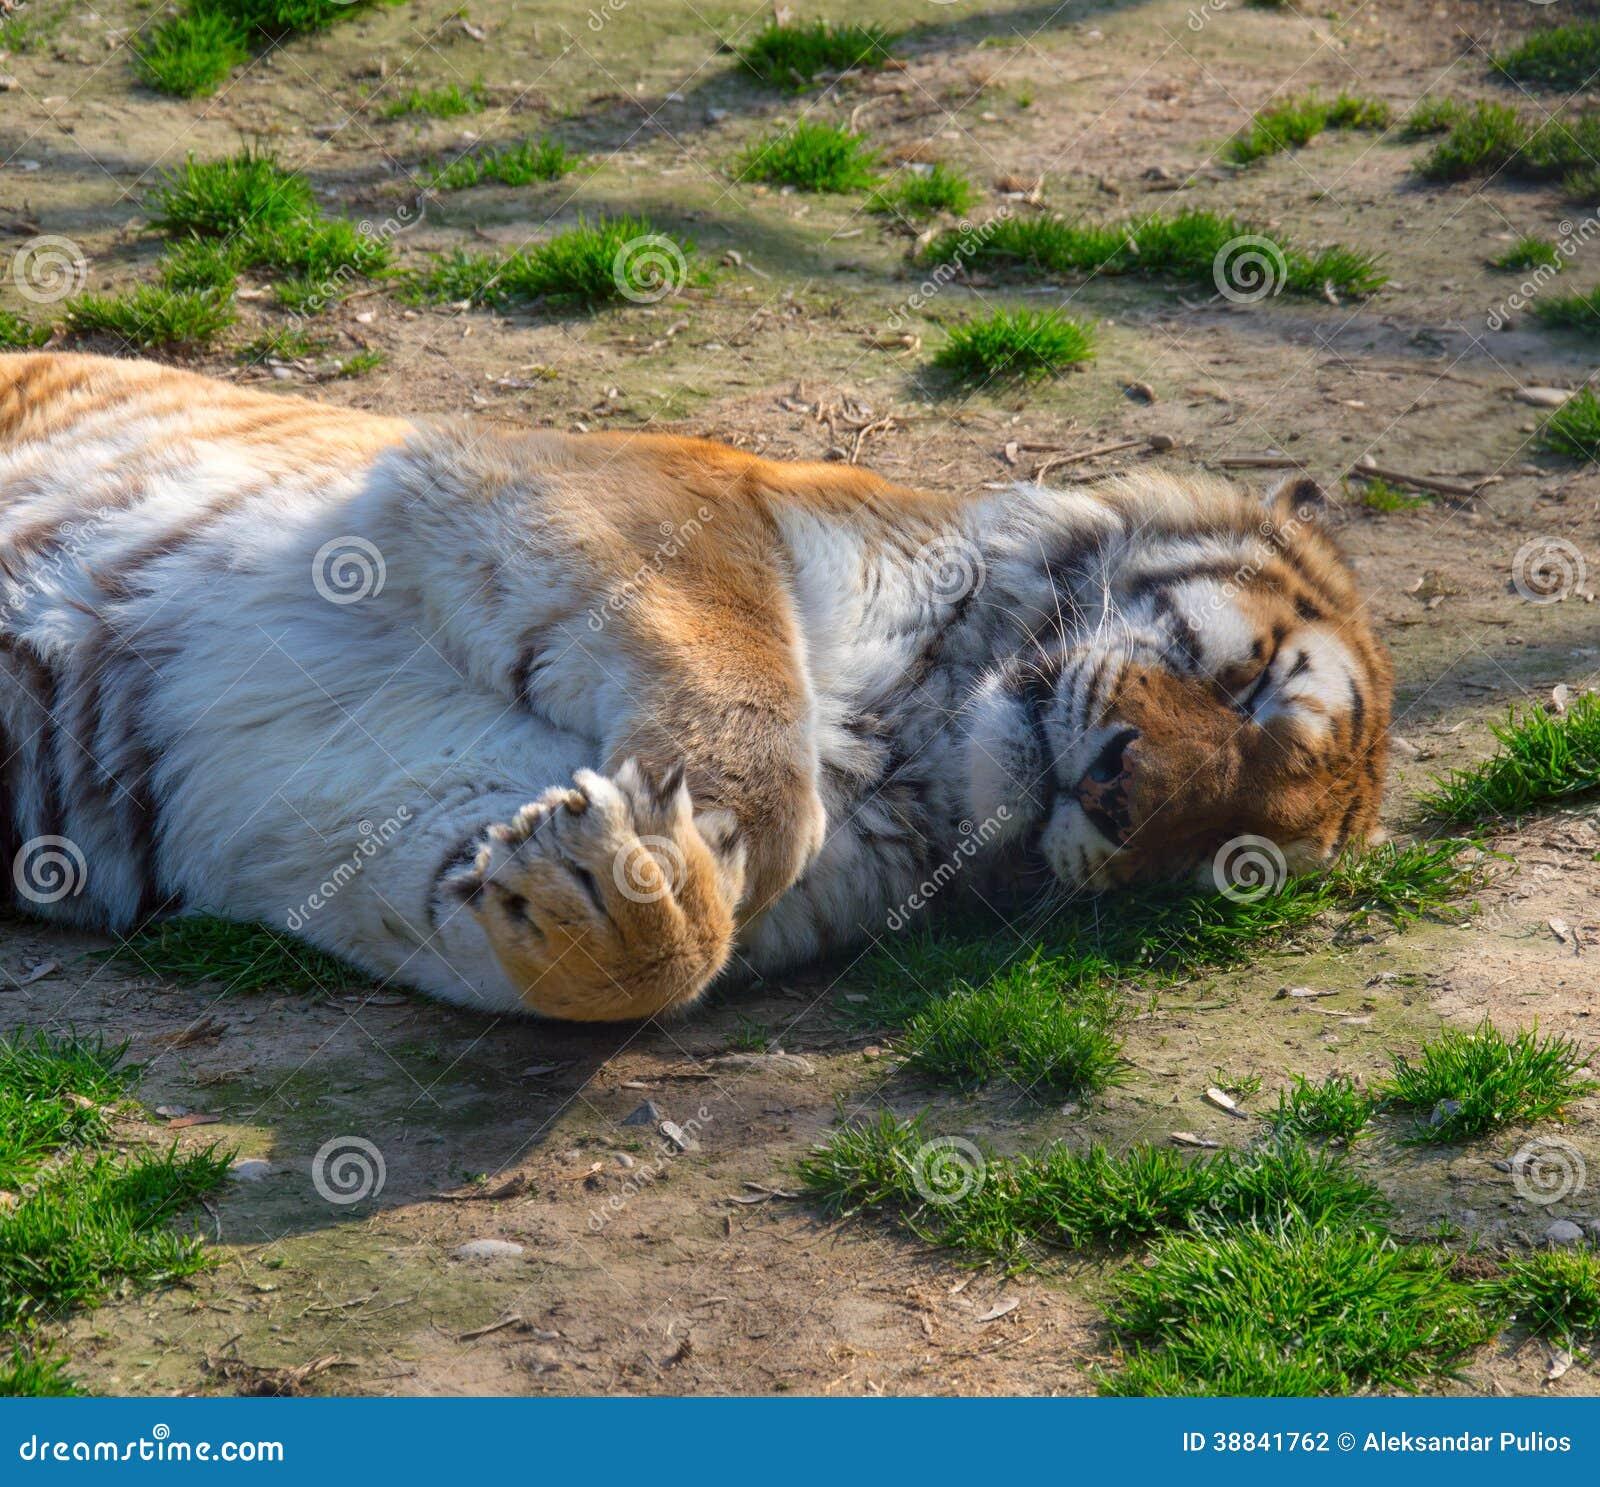 Siberiano Tiger Sleeping